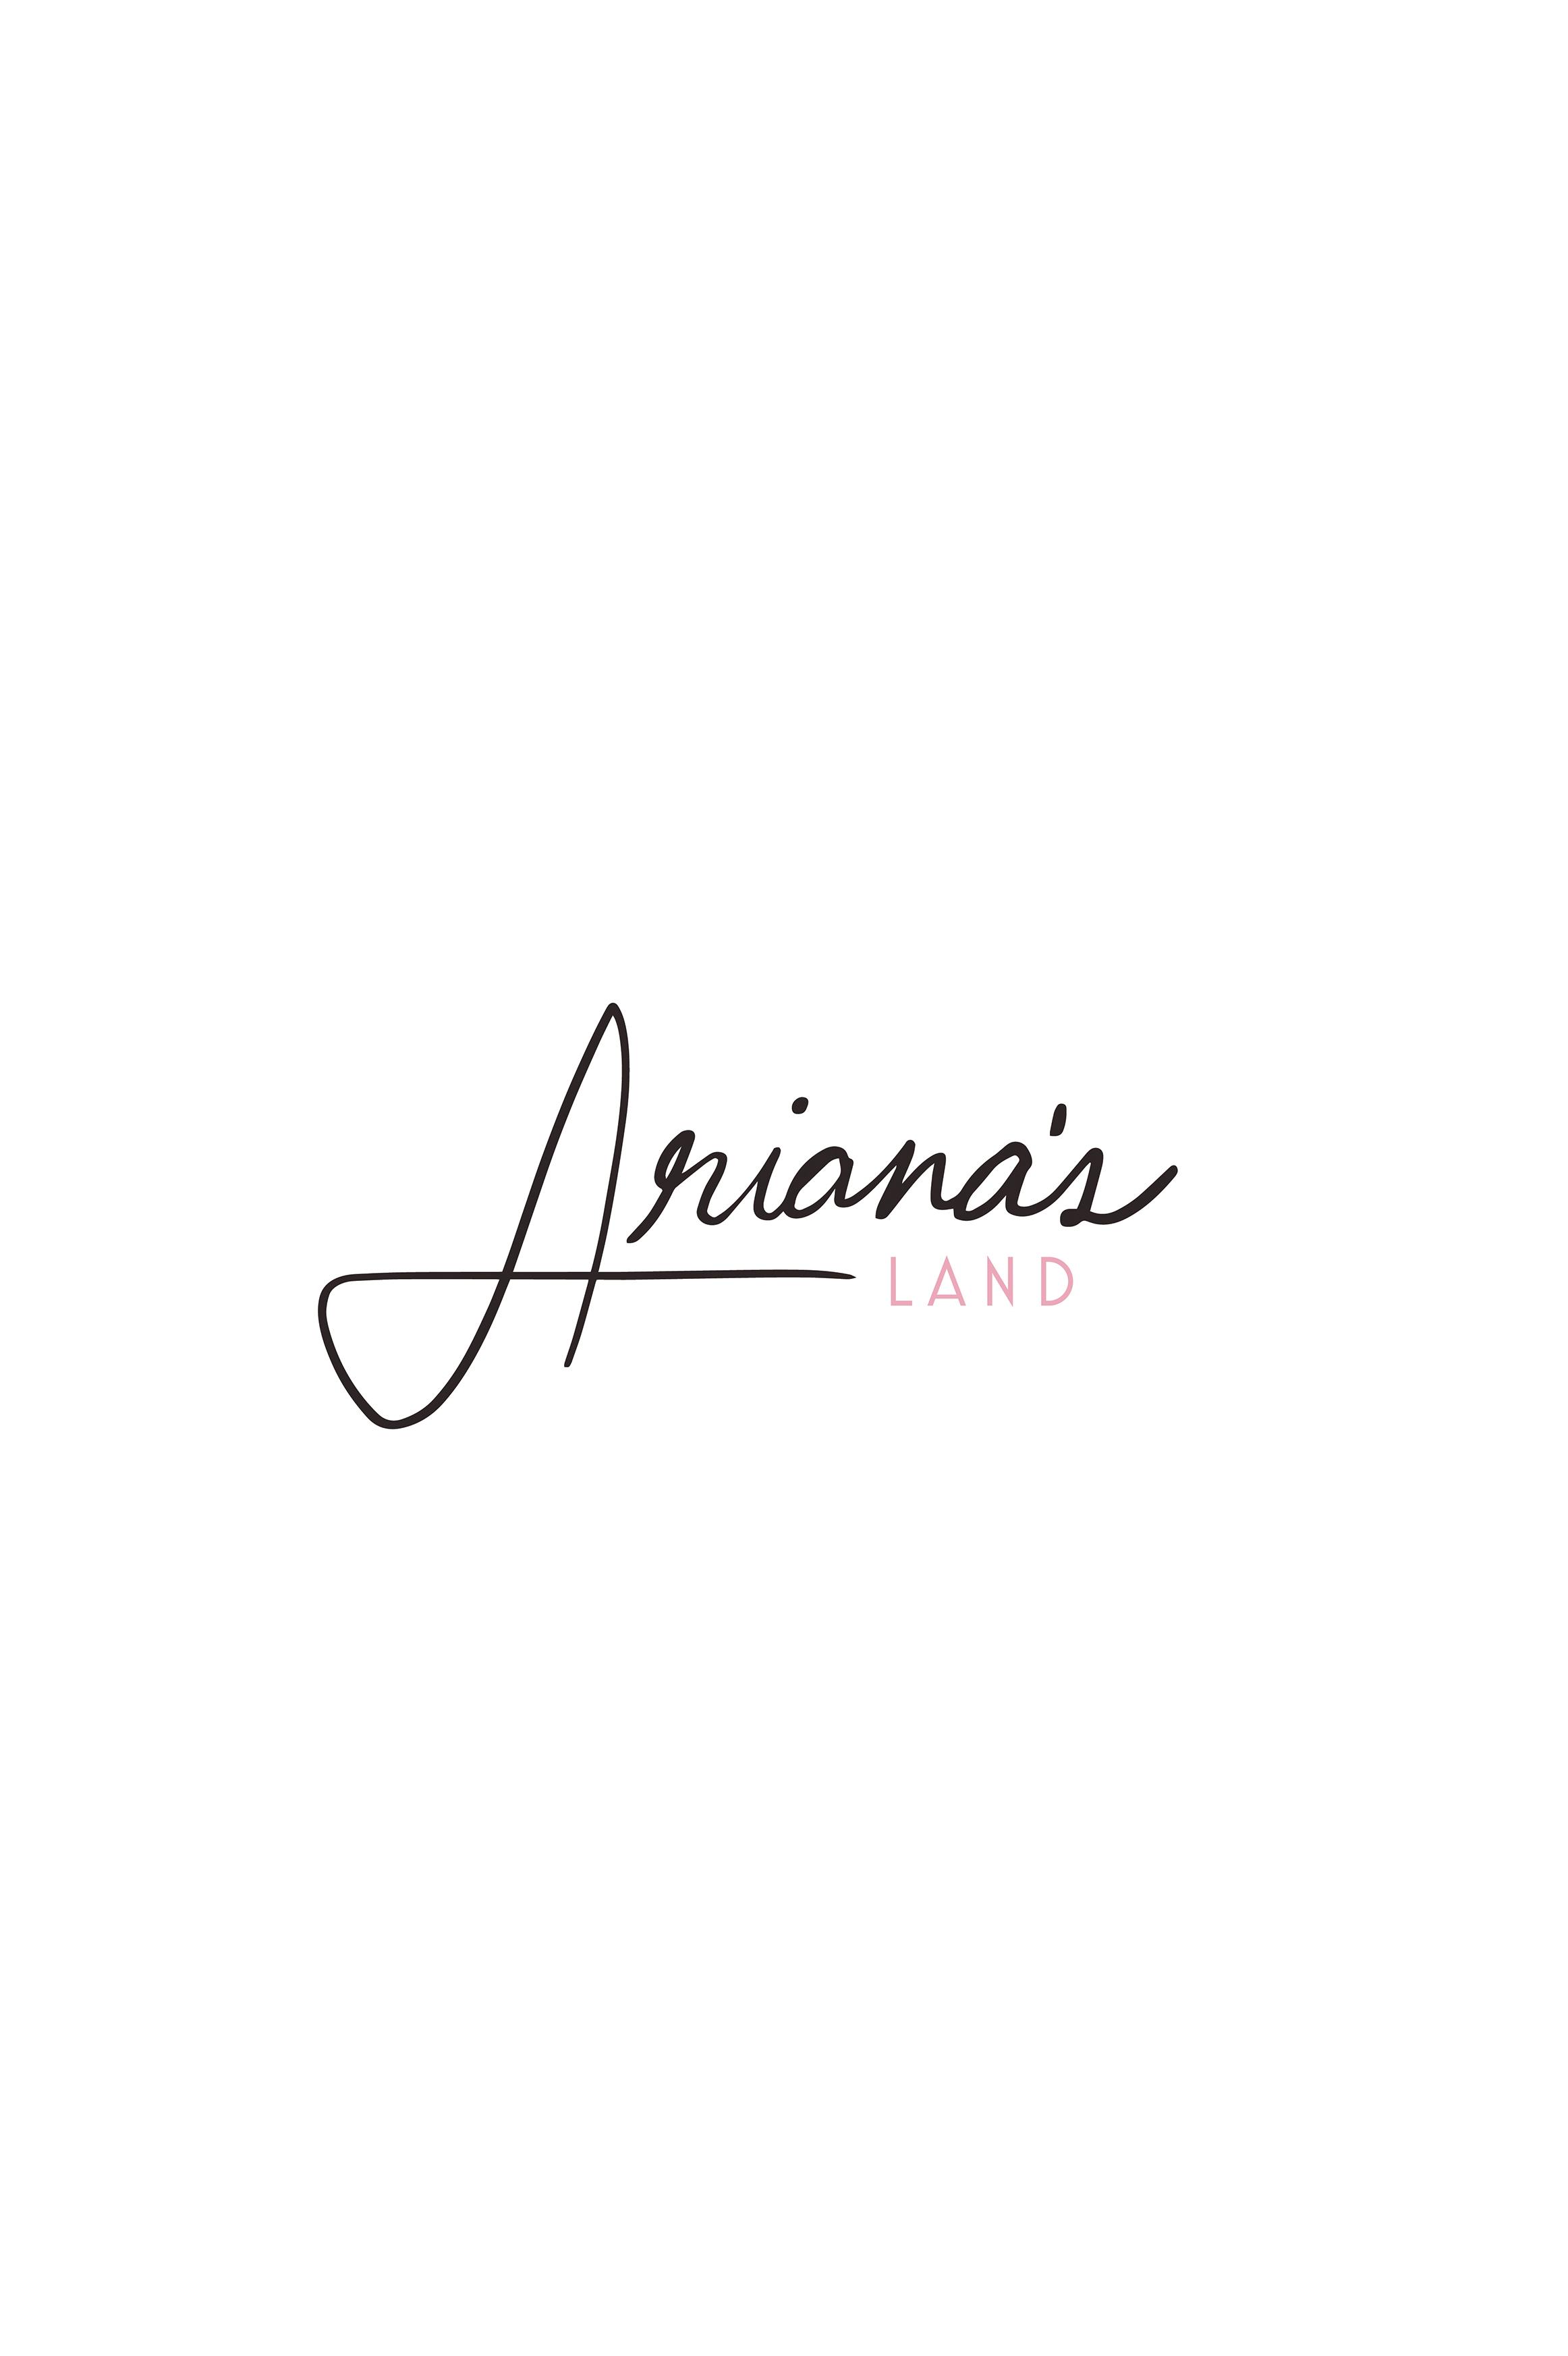 Ariana's Land